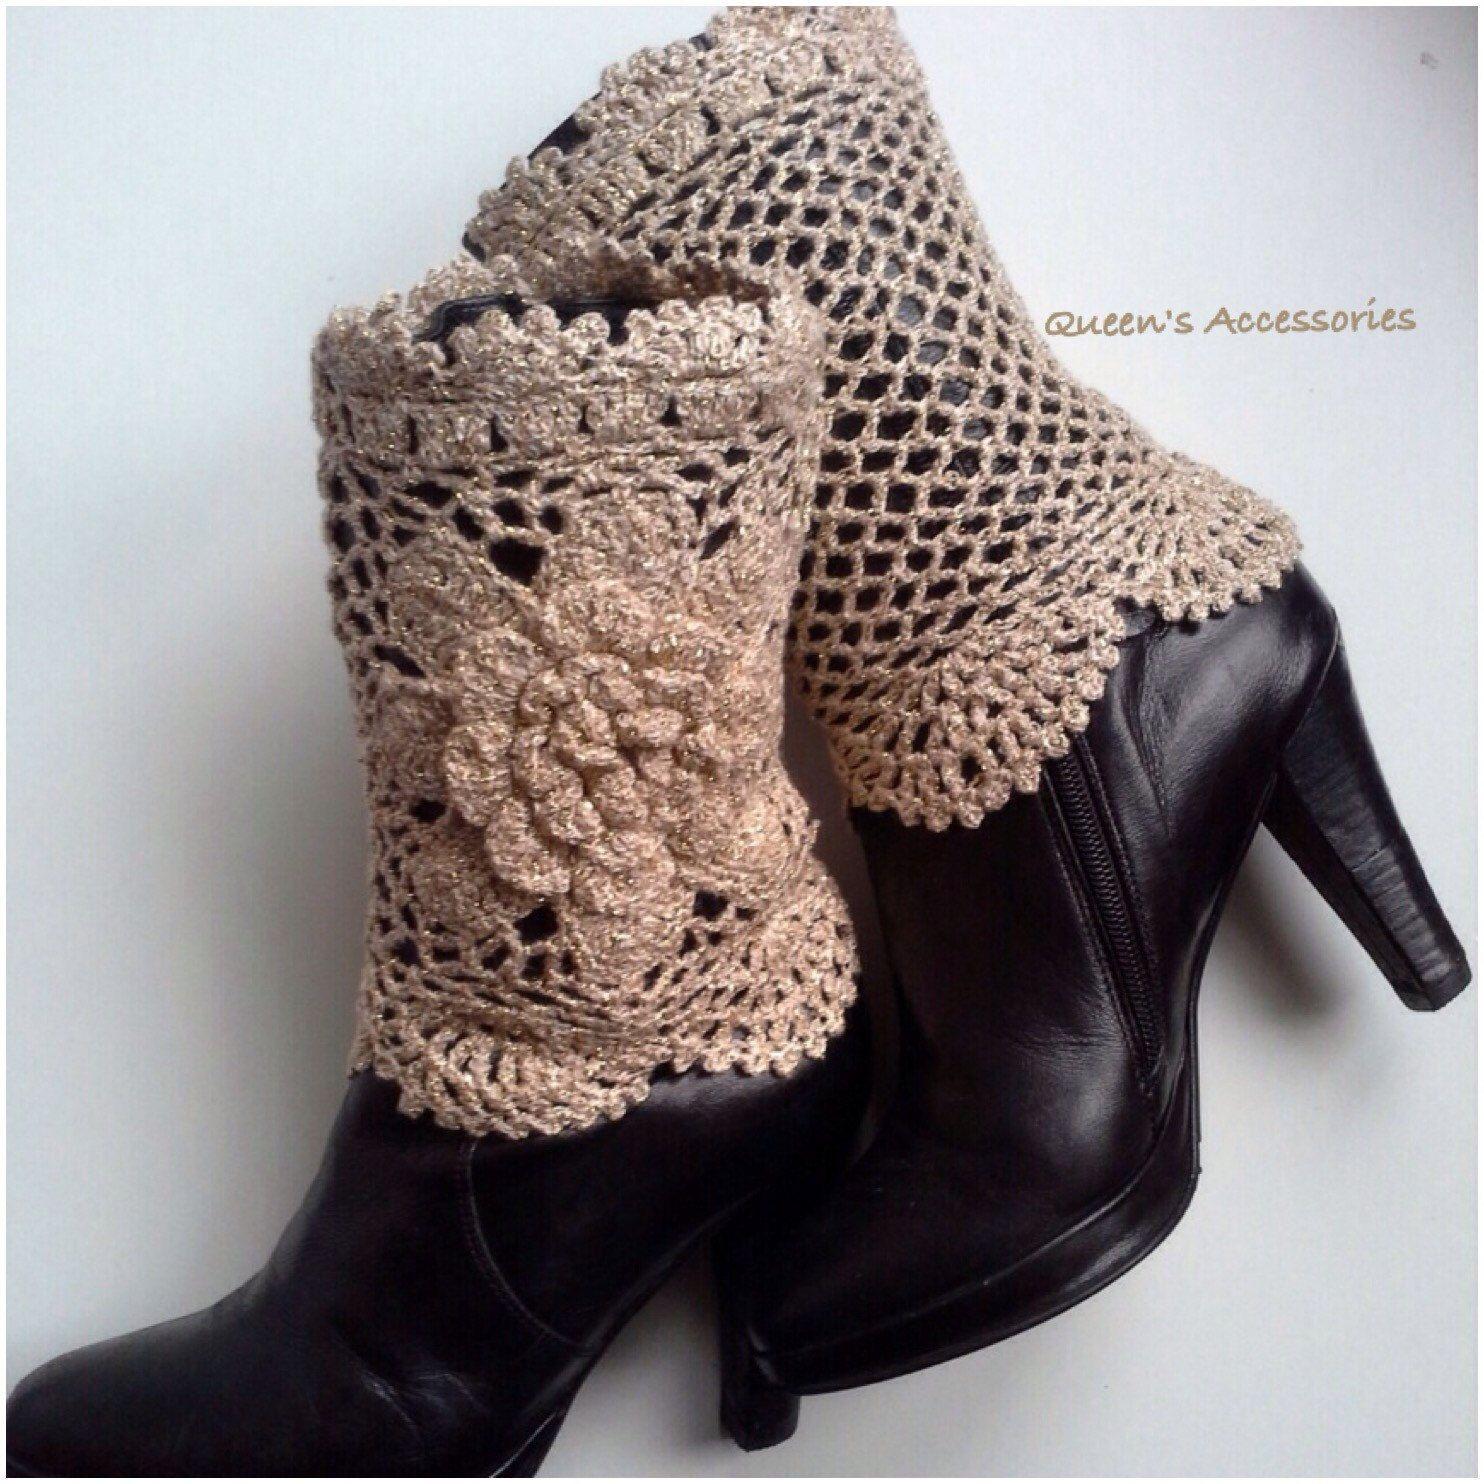 Best Selling Cuffs Crochet Cream Caramel with Gold Metallic Boot ...